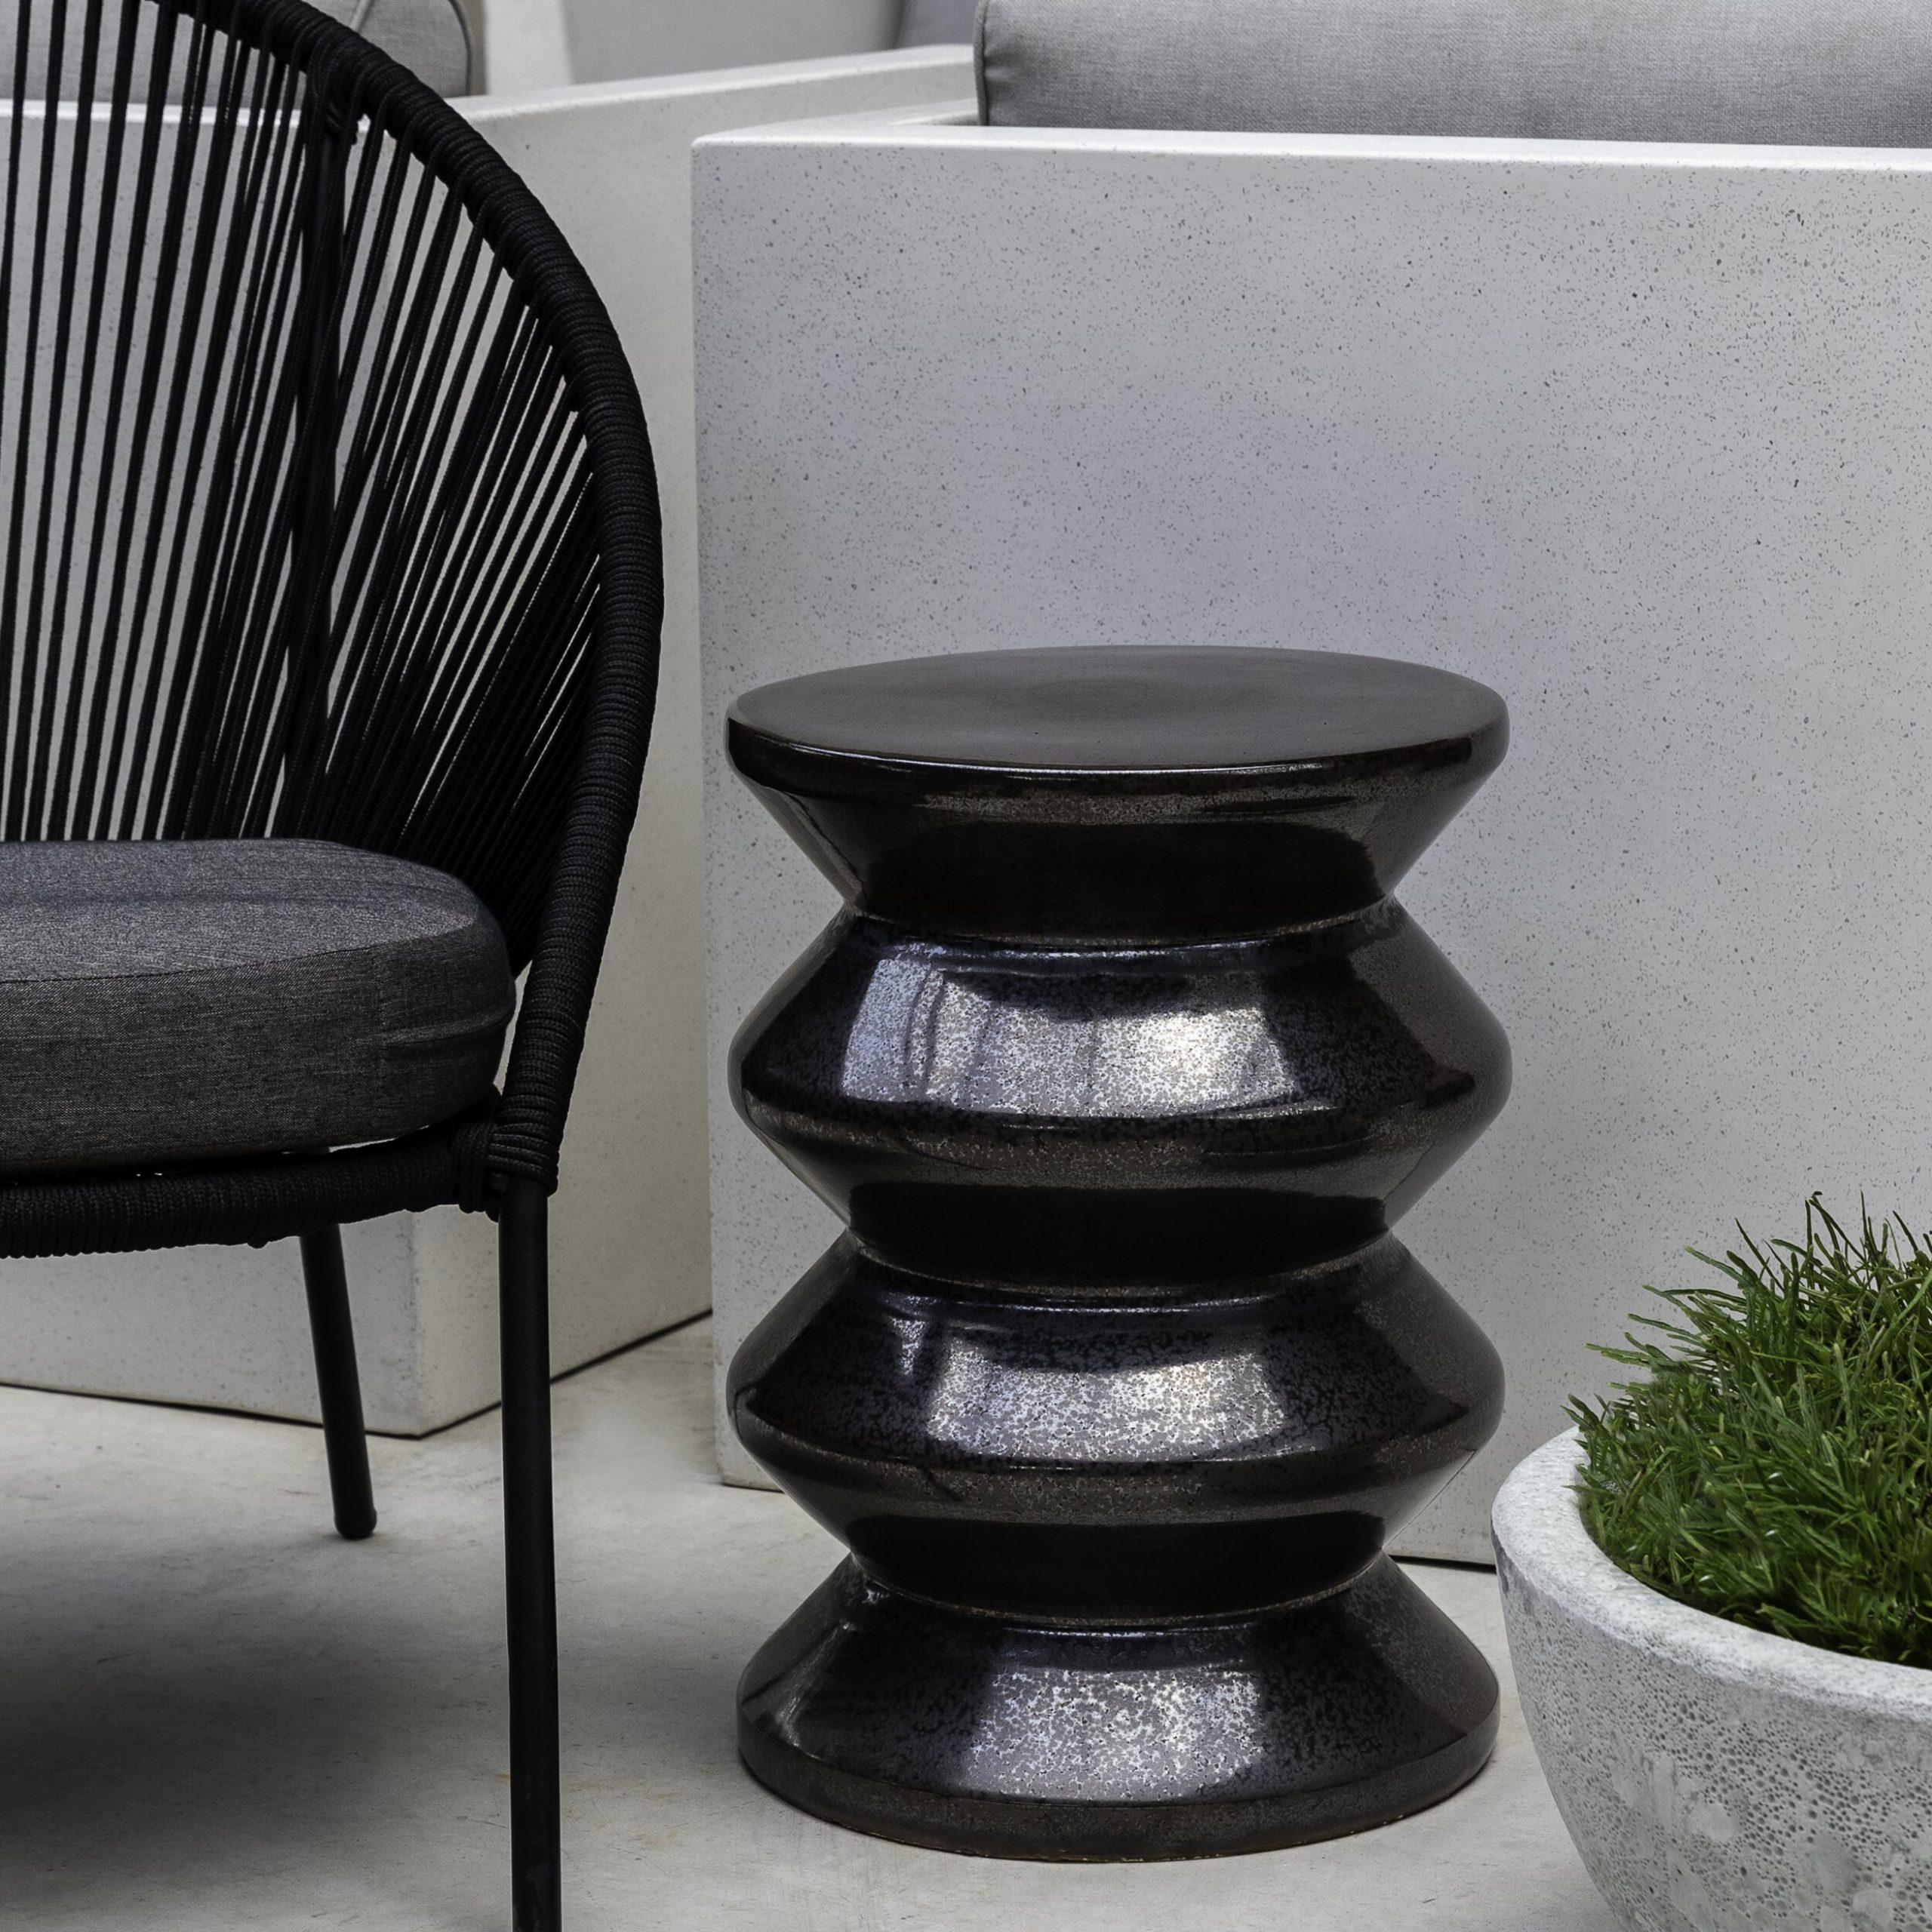 Zigzag Ceramic Garden Stool Within Carmon Ceramic Garden Tool (View 20 of 25)